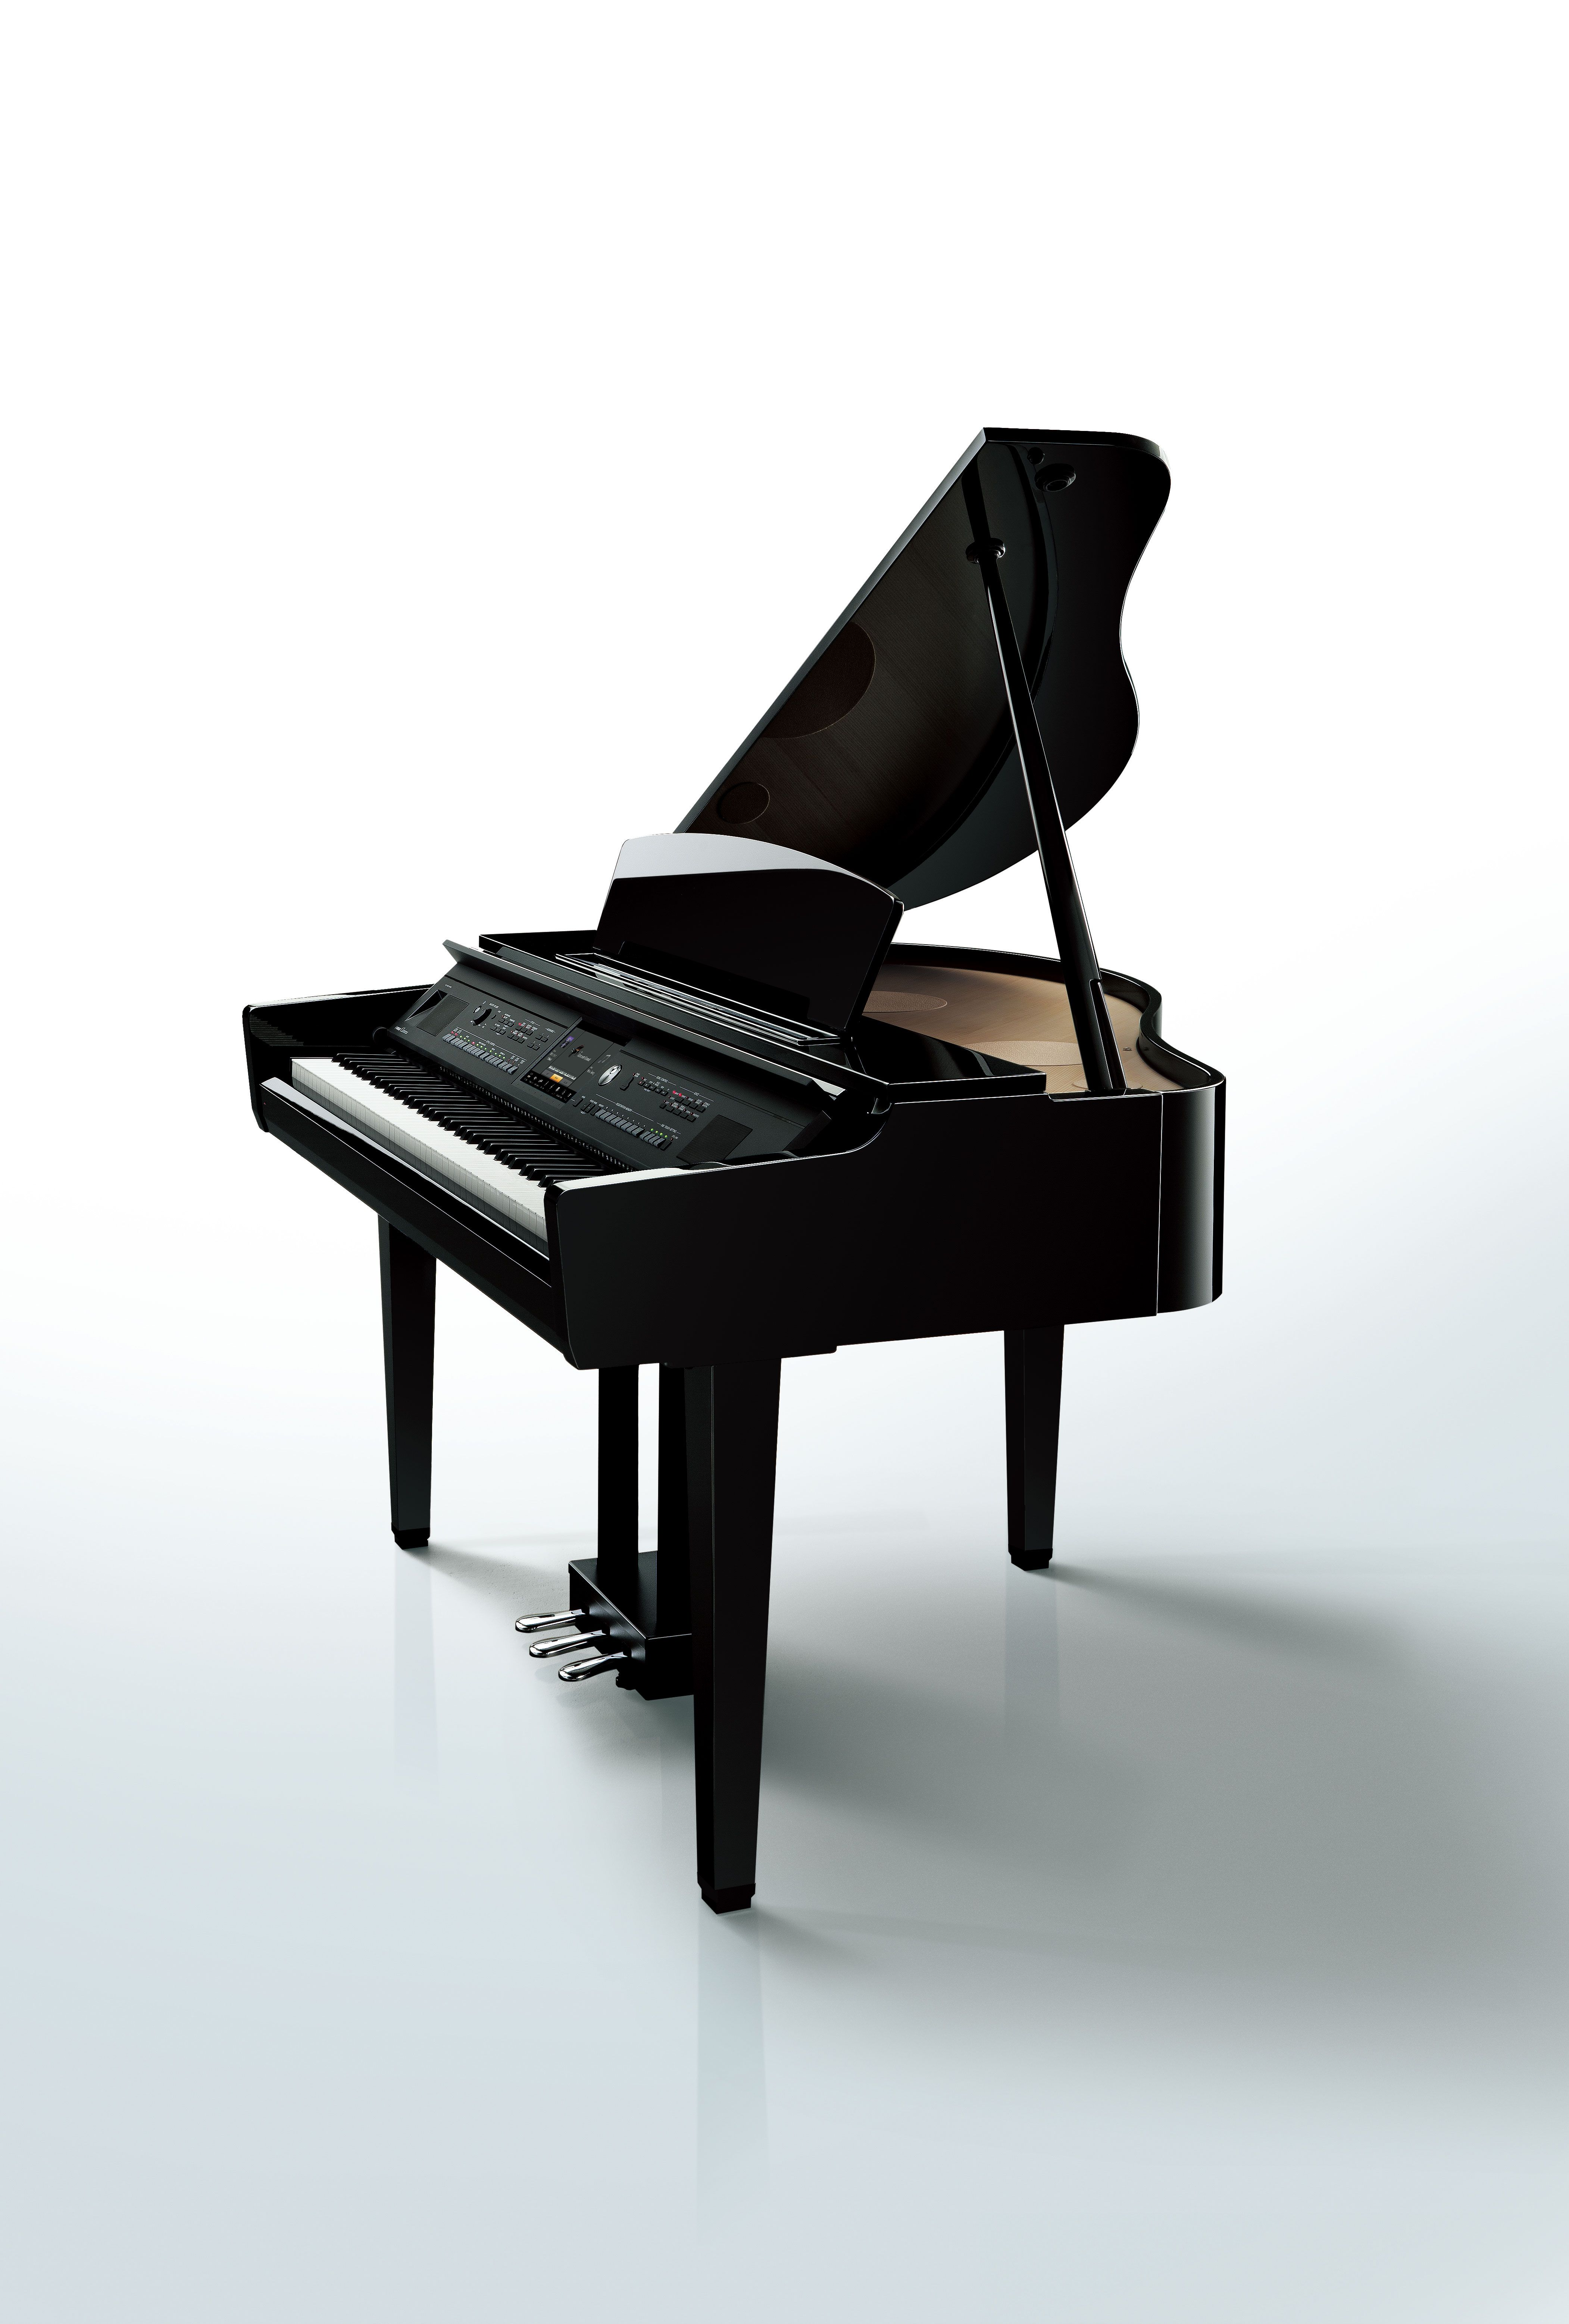 Clavinova Cvp 609gp Grand Style Digital Piano In A Polished Ebony Finish Romantic Bedroom Decor Bedroom Decor Piano Decor